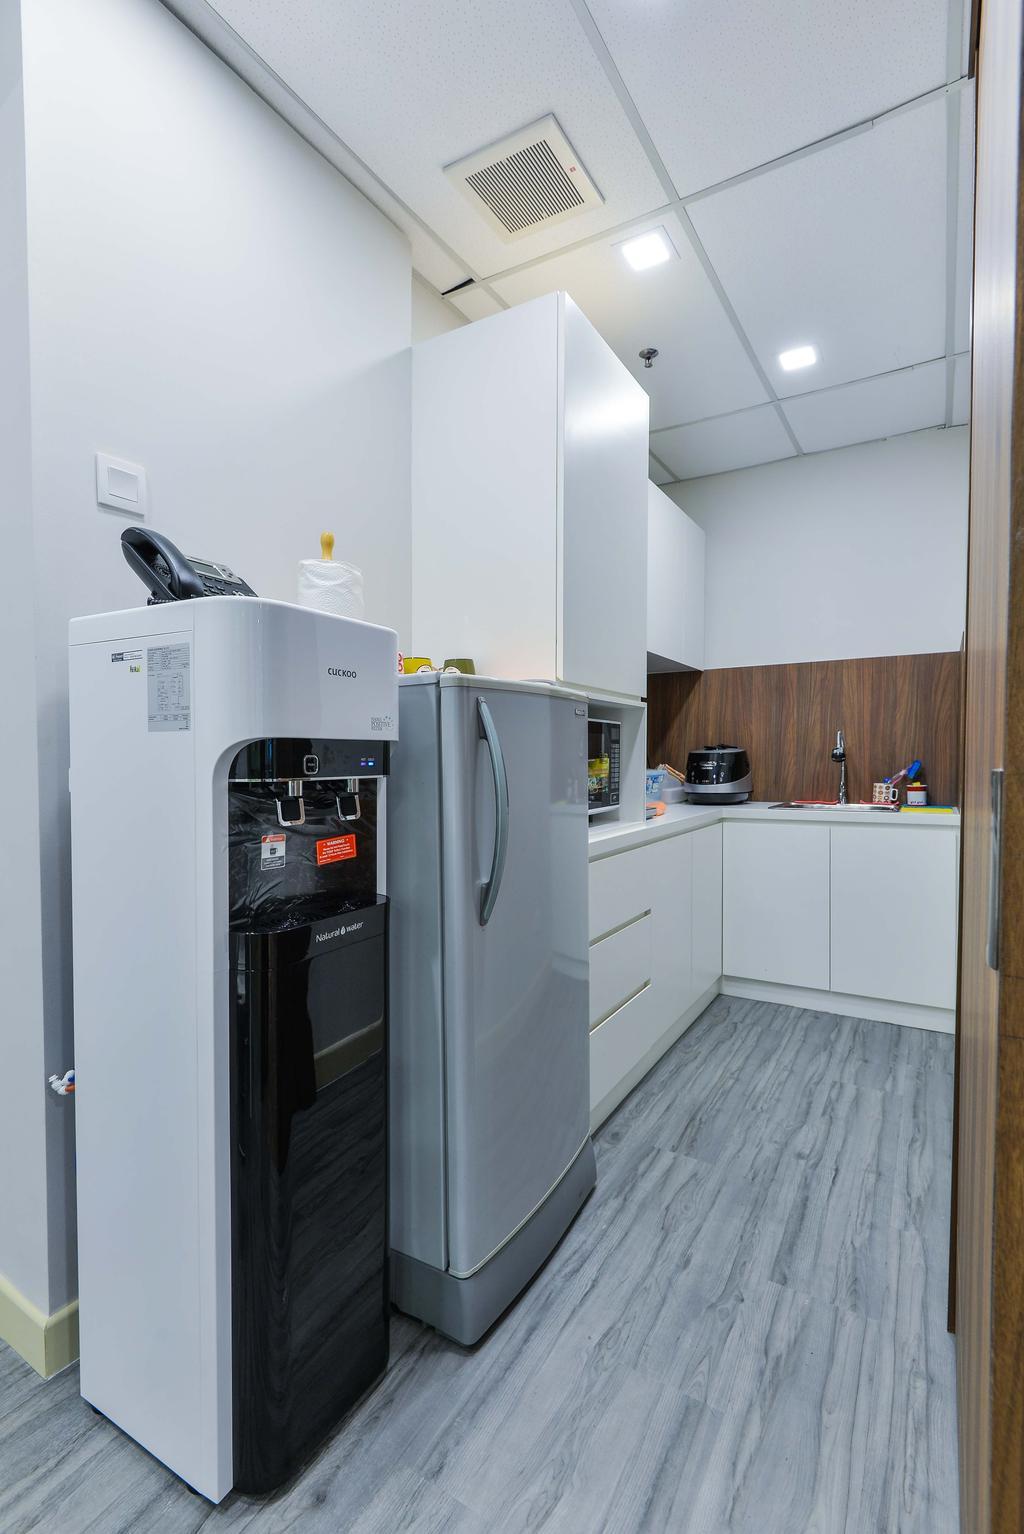 MLS Capital- G-Tower Jln Tun Razak, Commercial, Interior Designer, Torch Empire, Modern, Appliance, Electrical Device, Fridge, Refrigerator